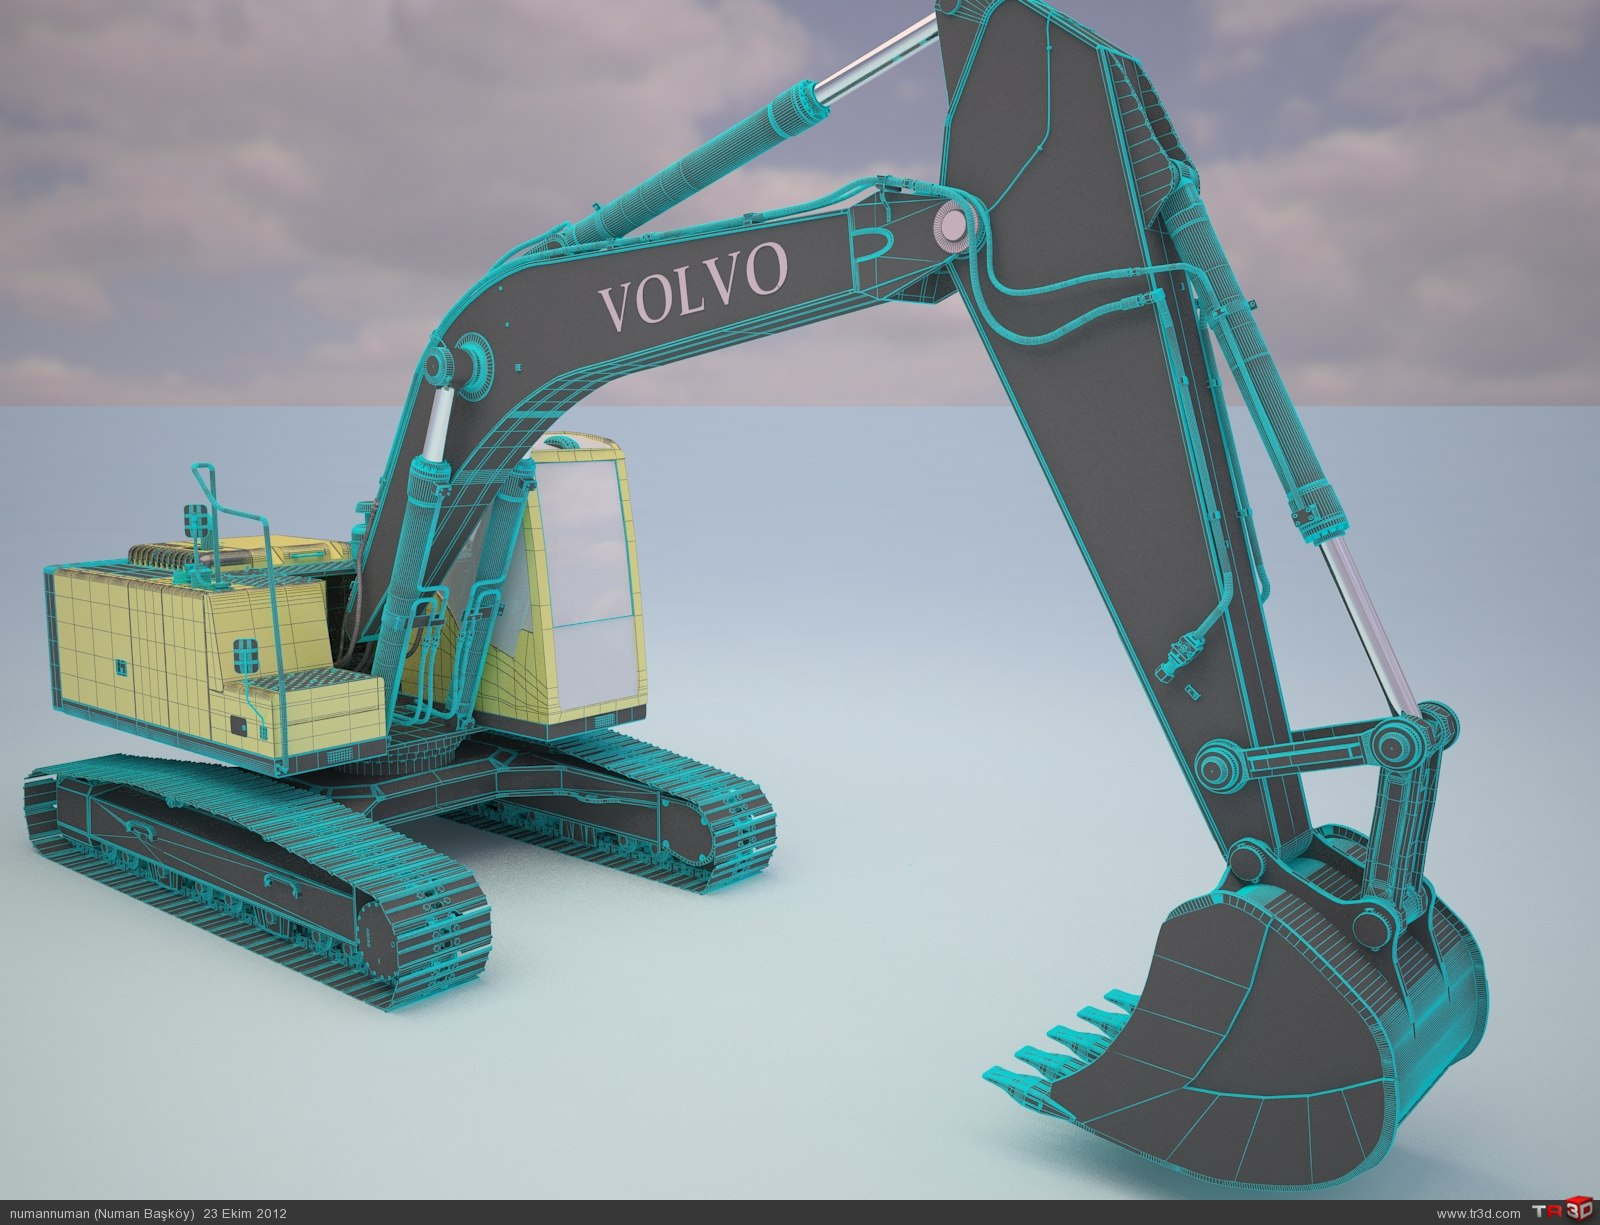 Volvo EC210CL